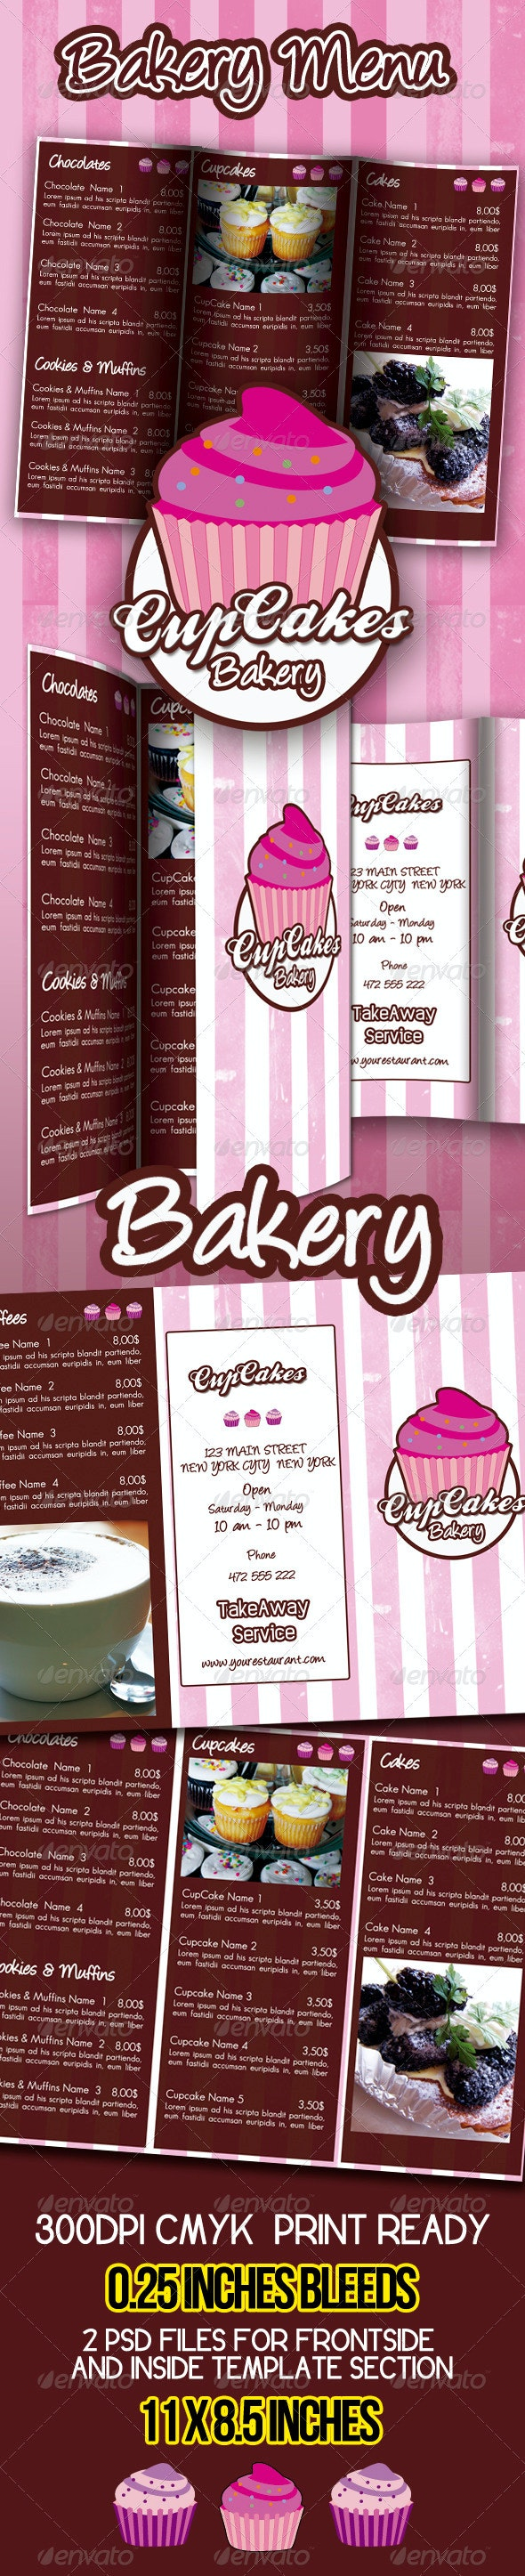 Bakery Menu Template - Food Menus Print Templates